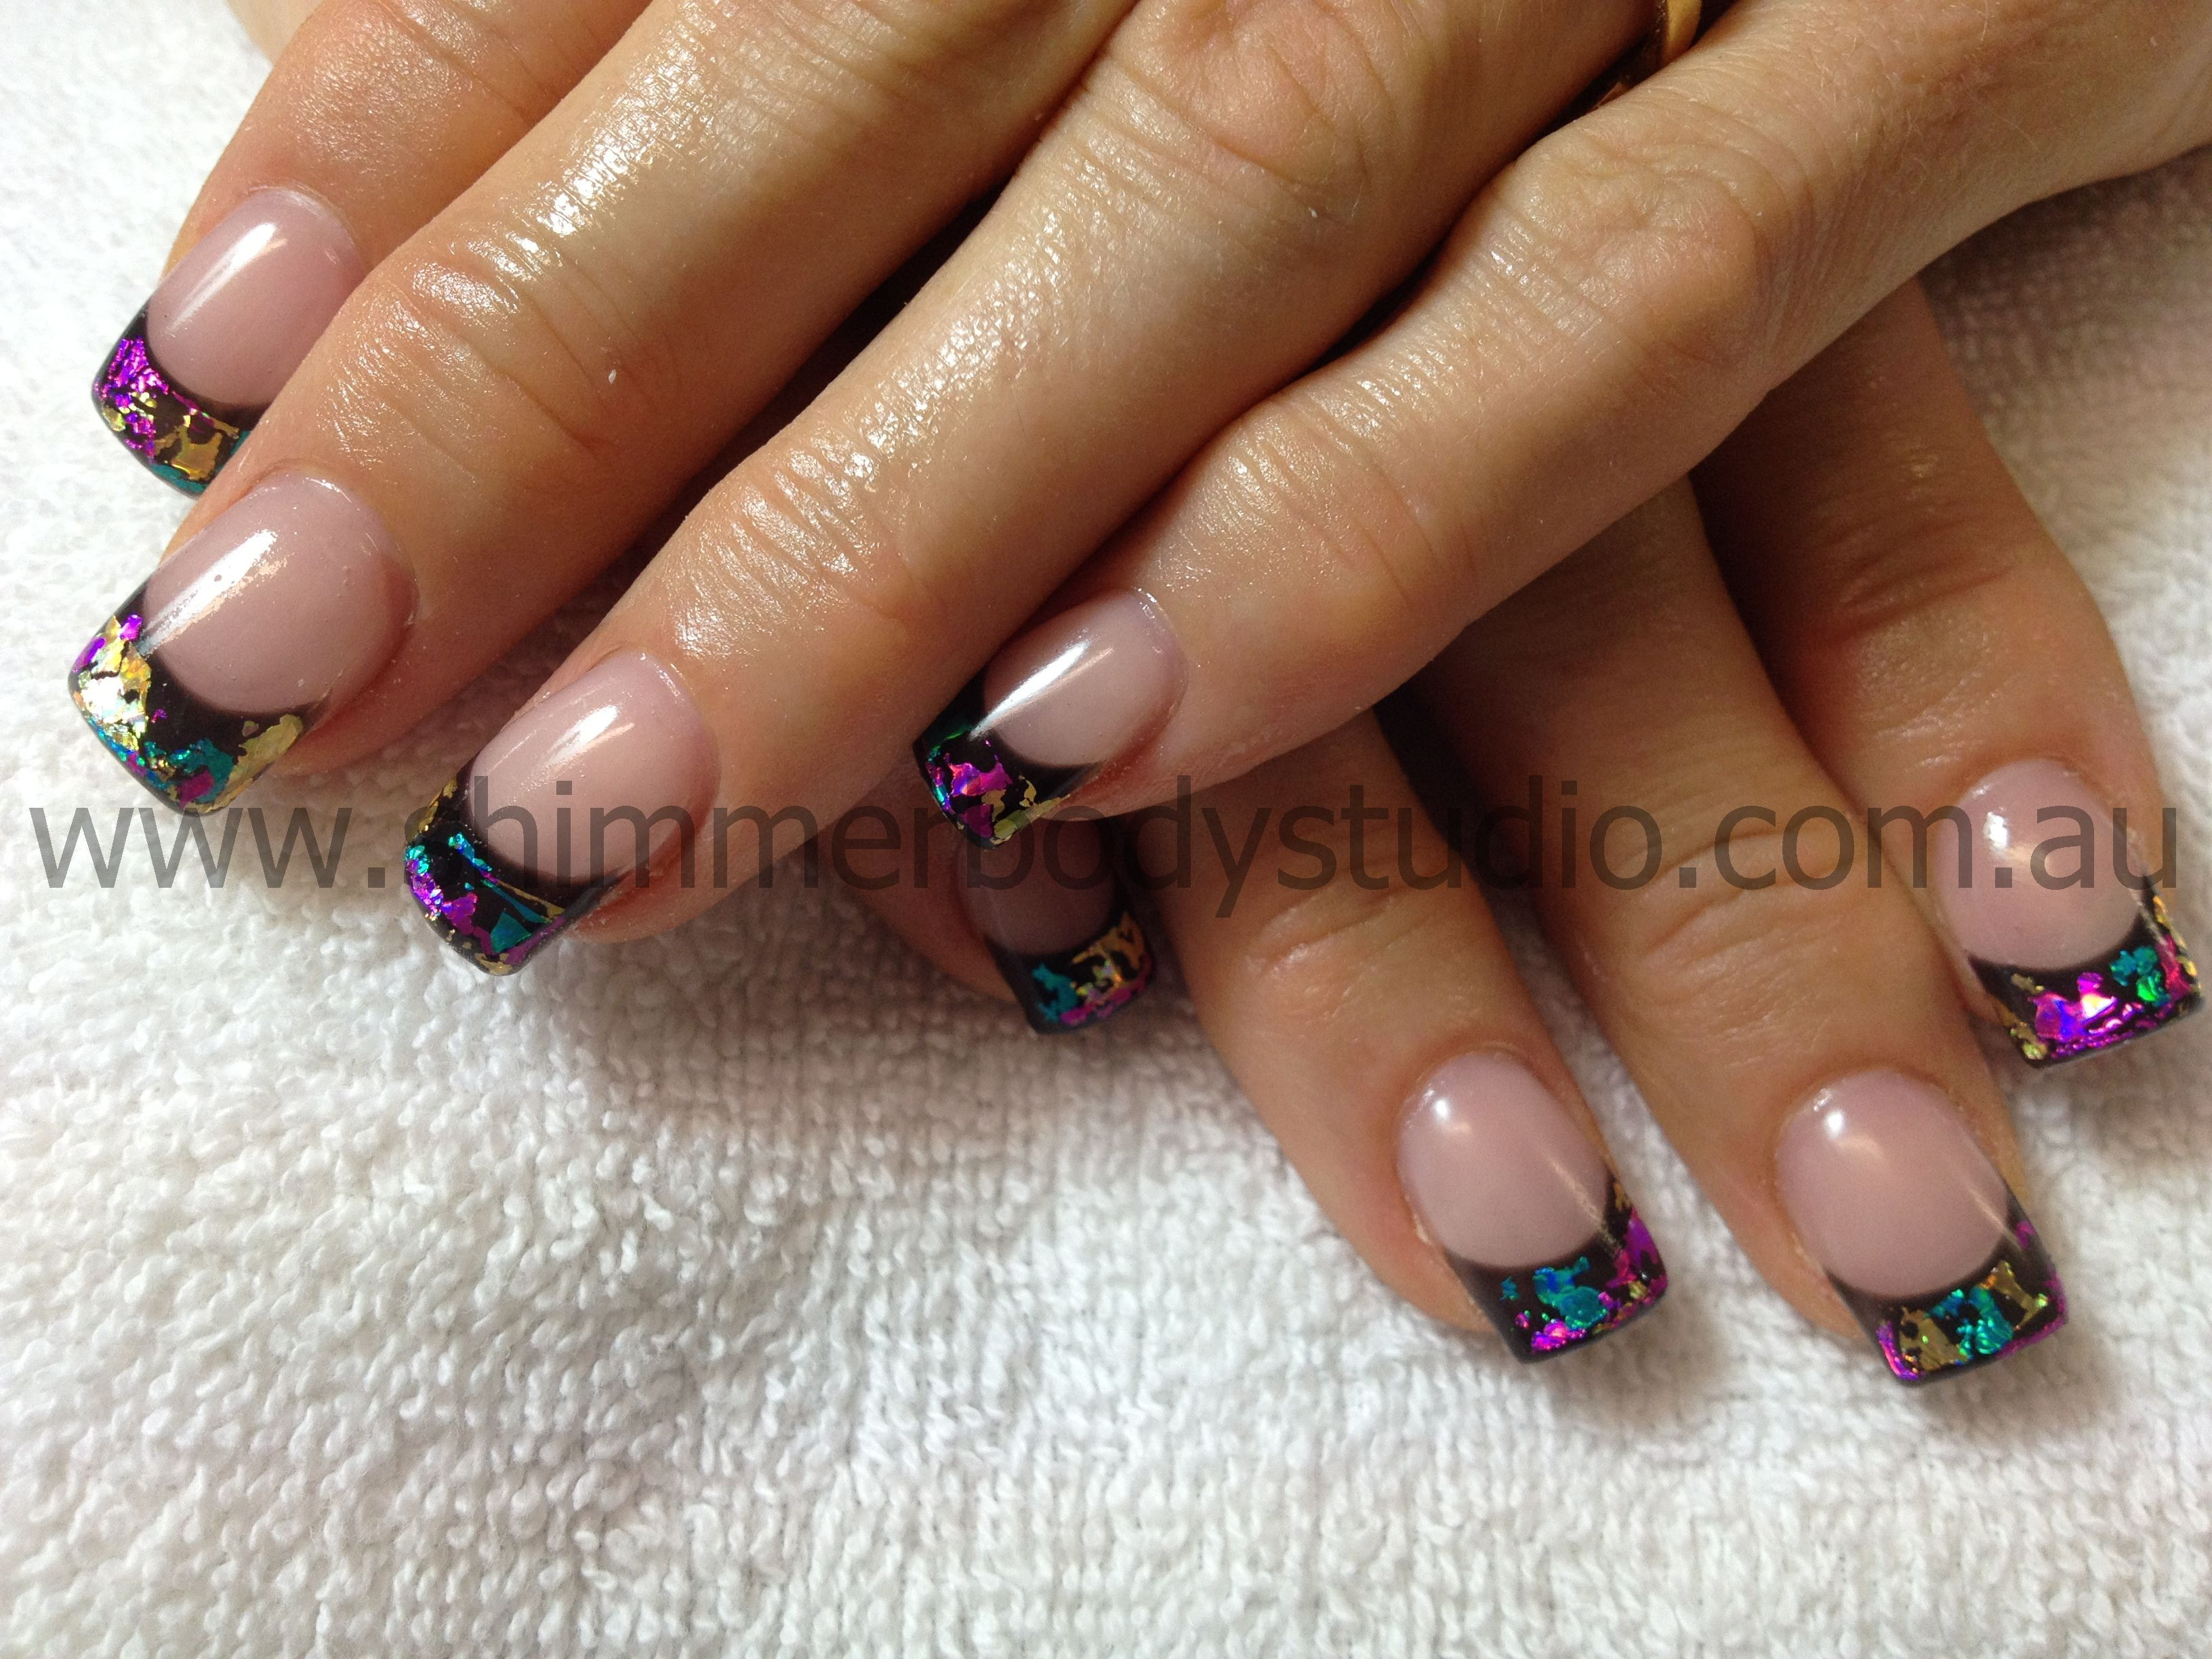 Gel nails, Foil Nail Art, Colourful nails. | Nails | Pinterest ...